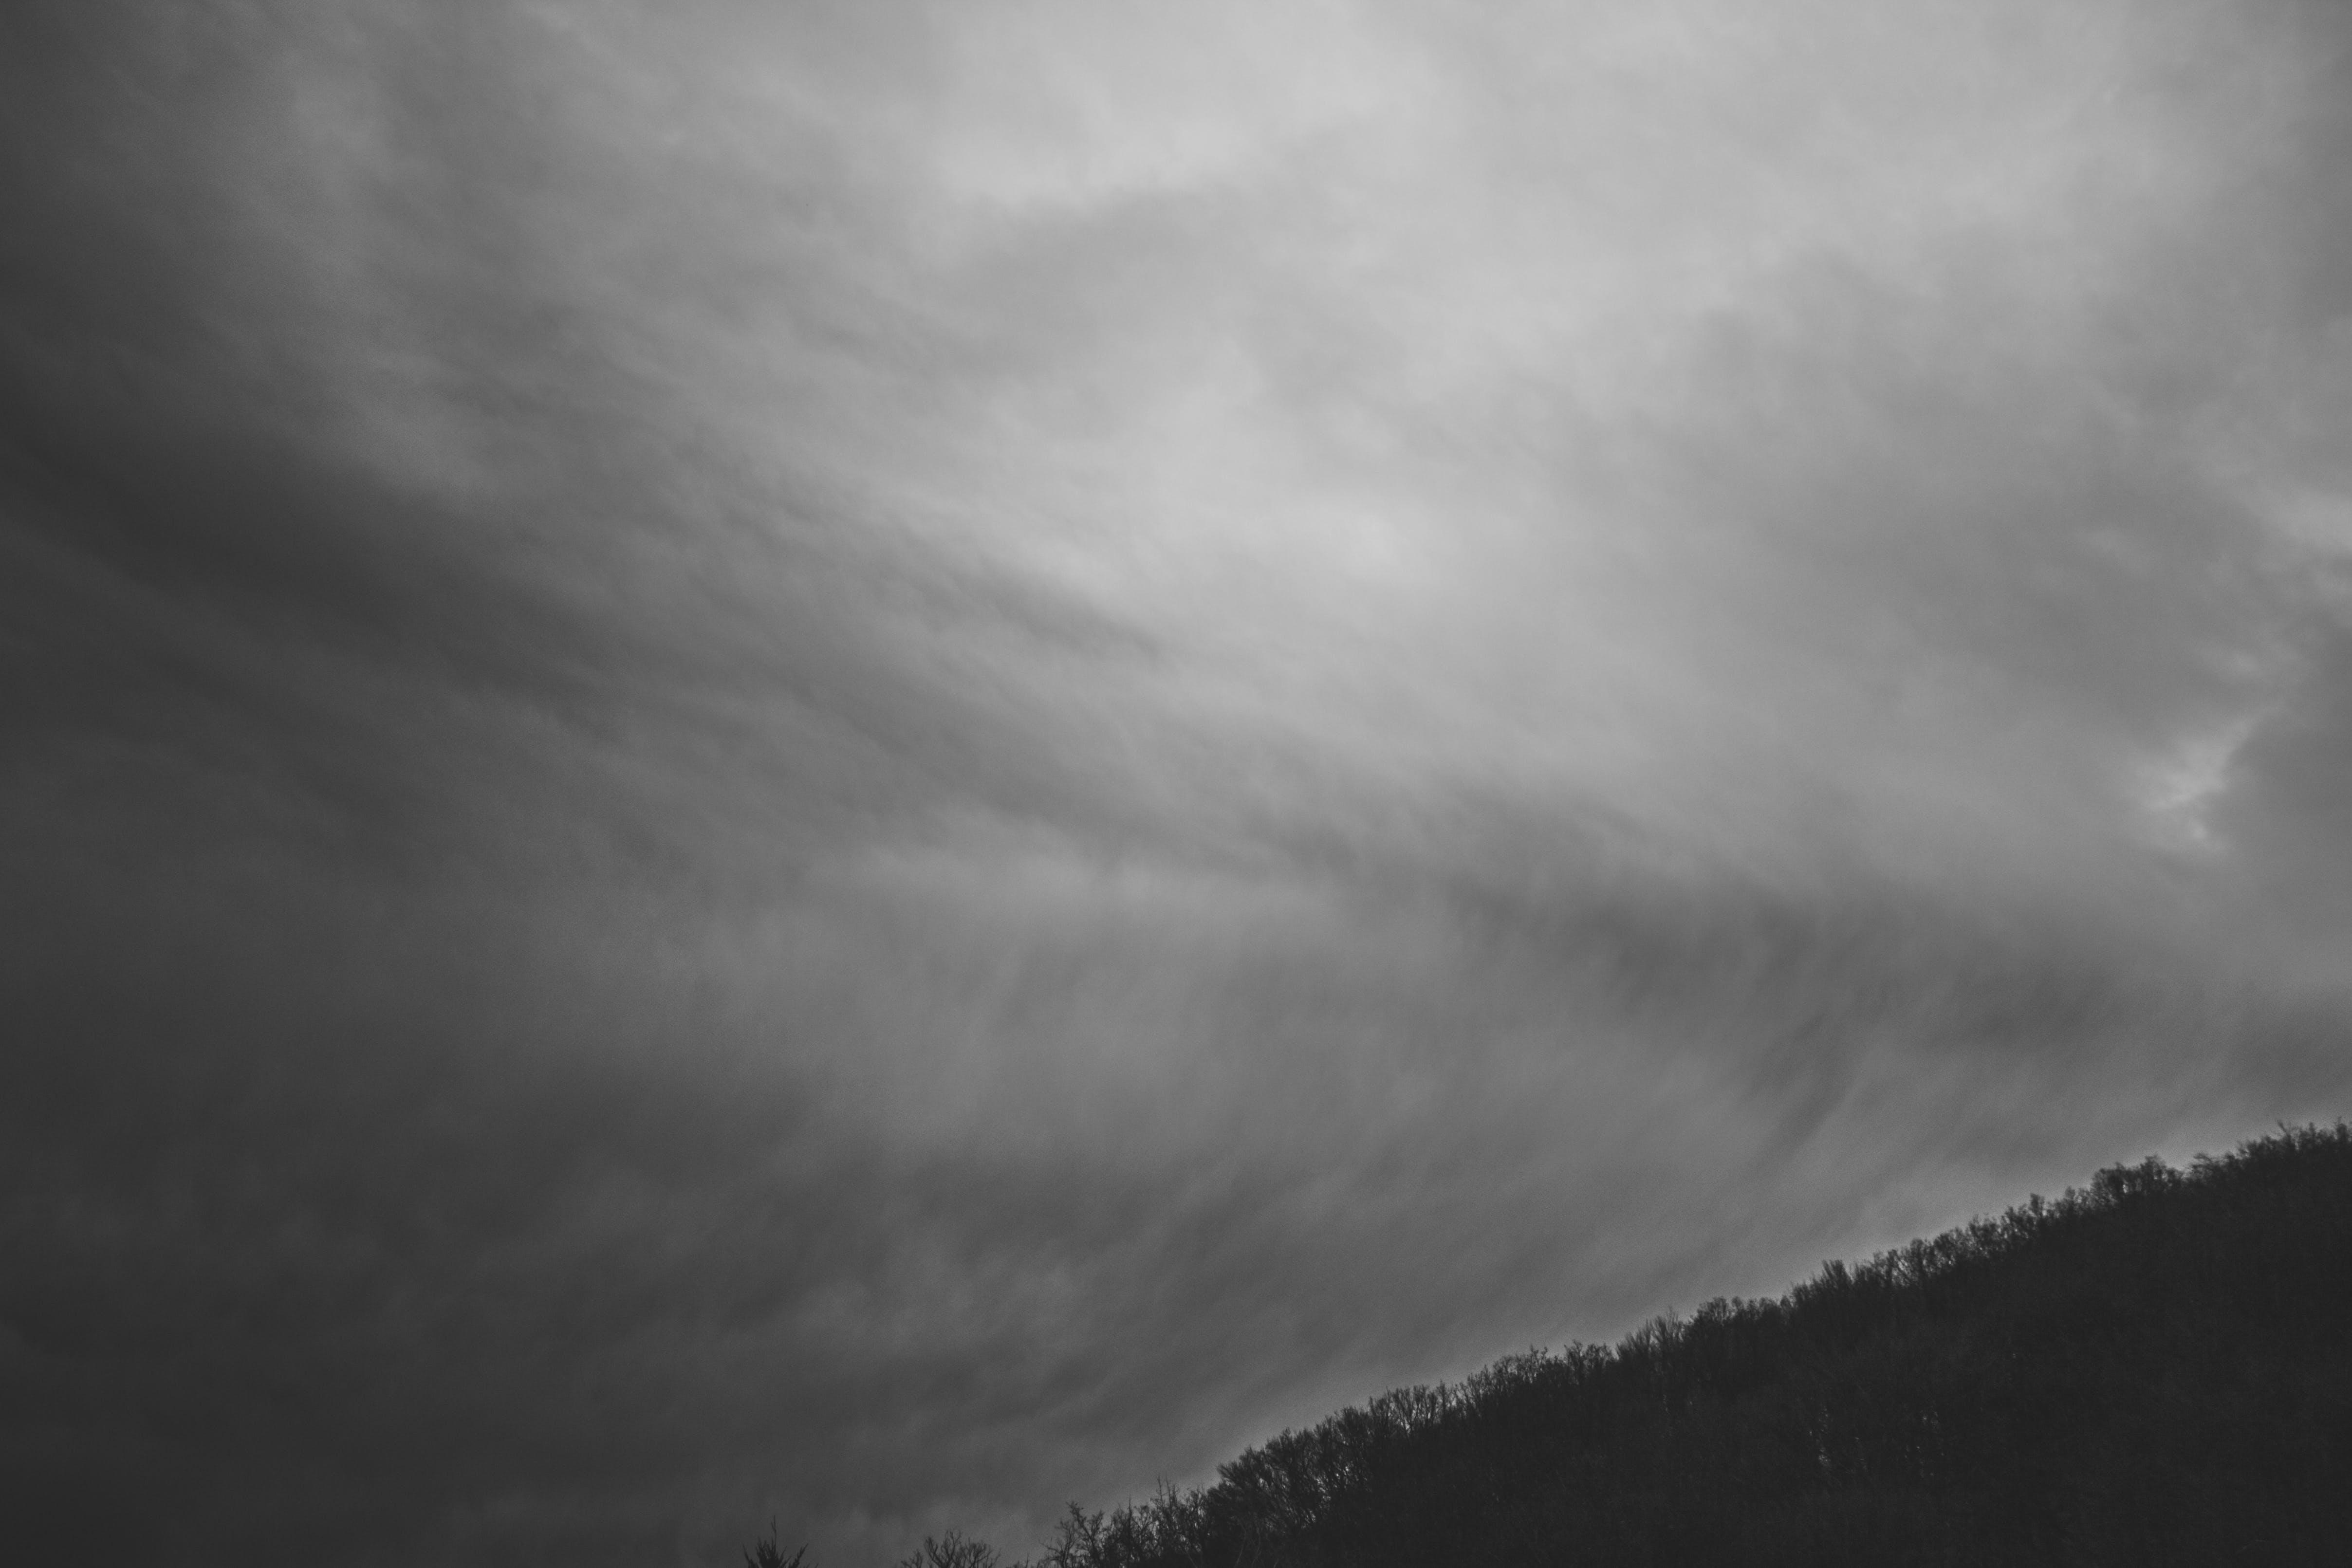 Grayscale Photo of a Sky